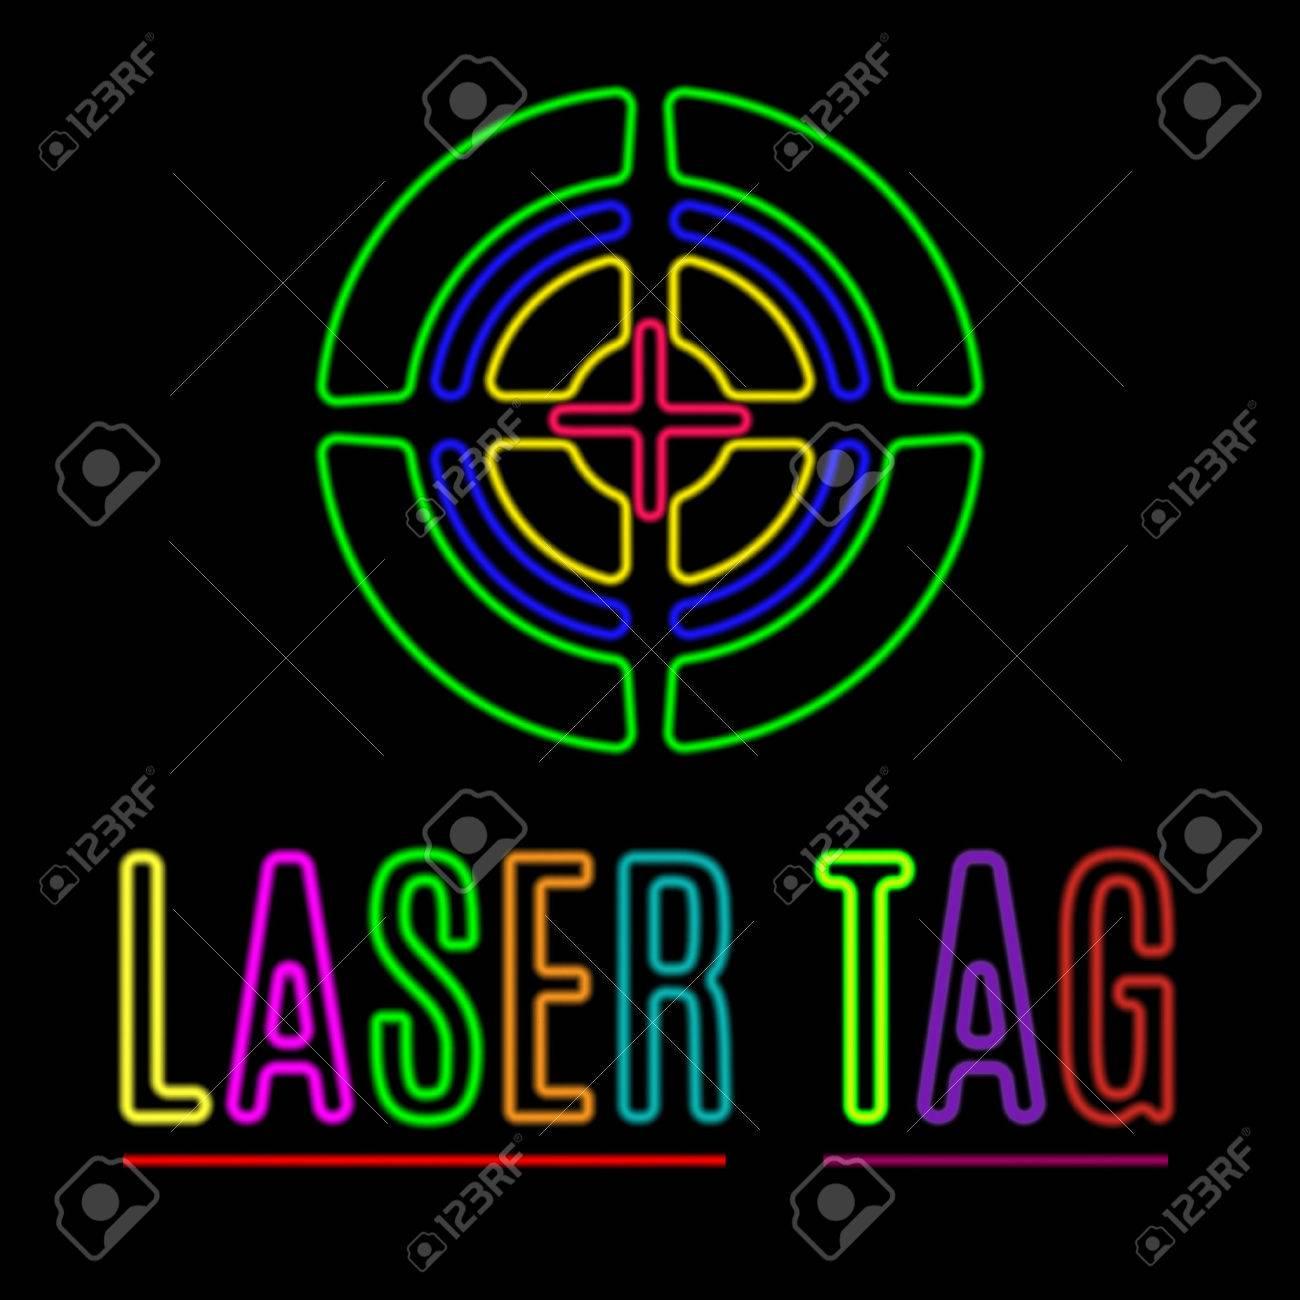 Картинки по запросу лазертаг арт